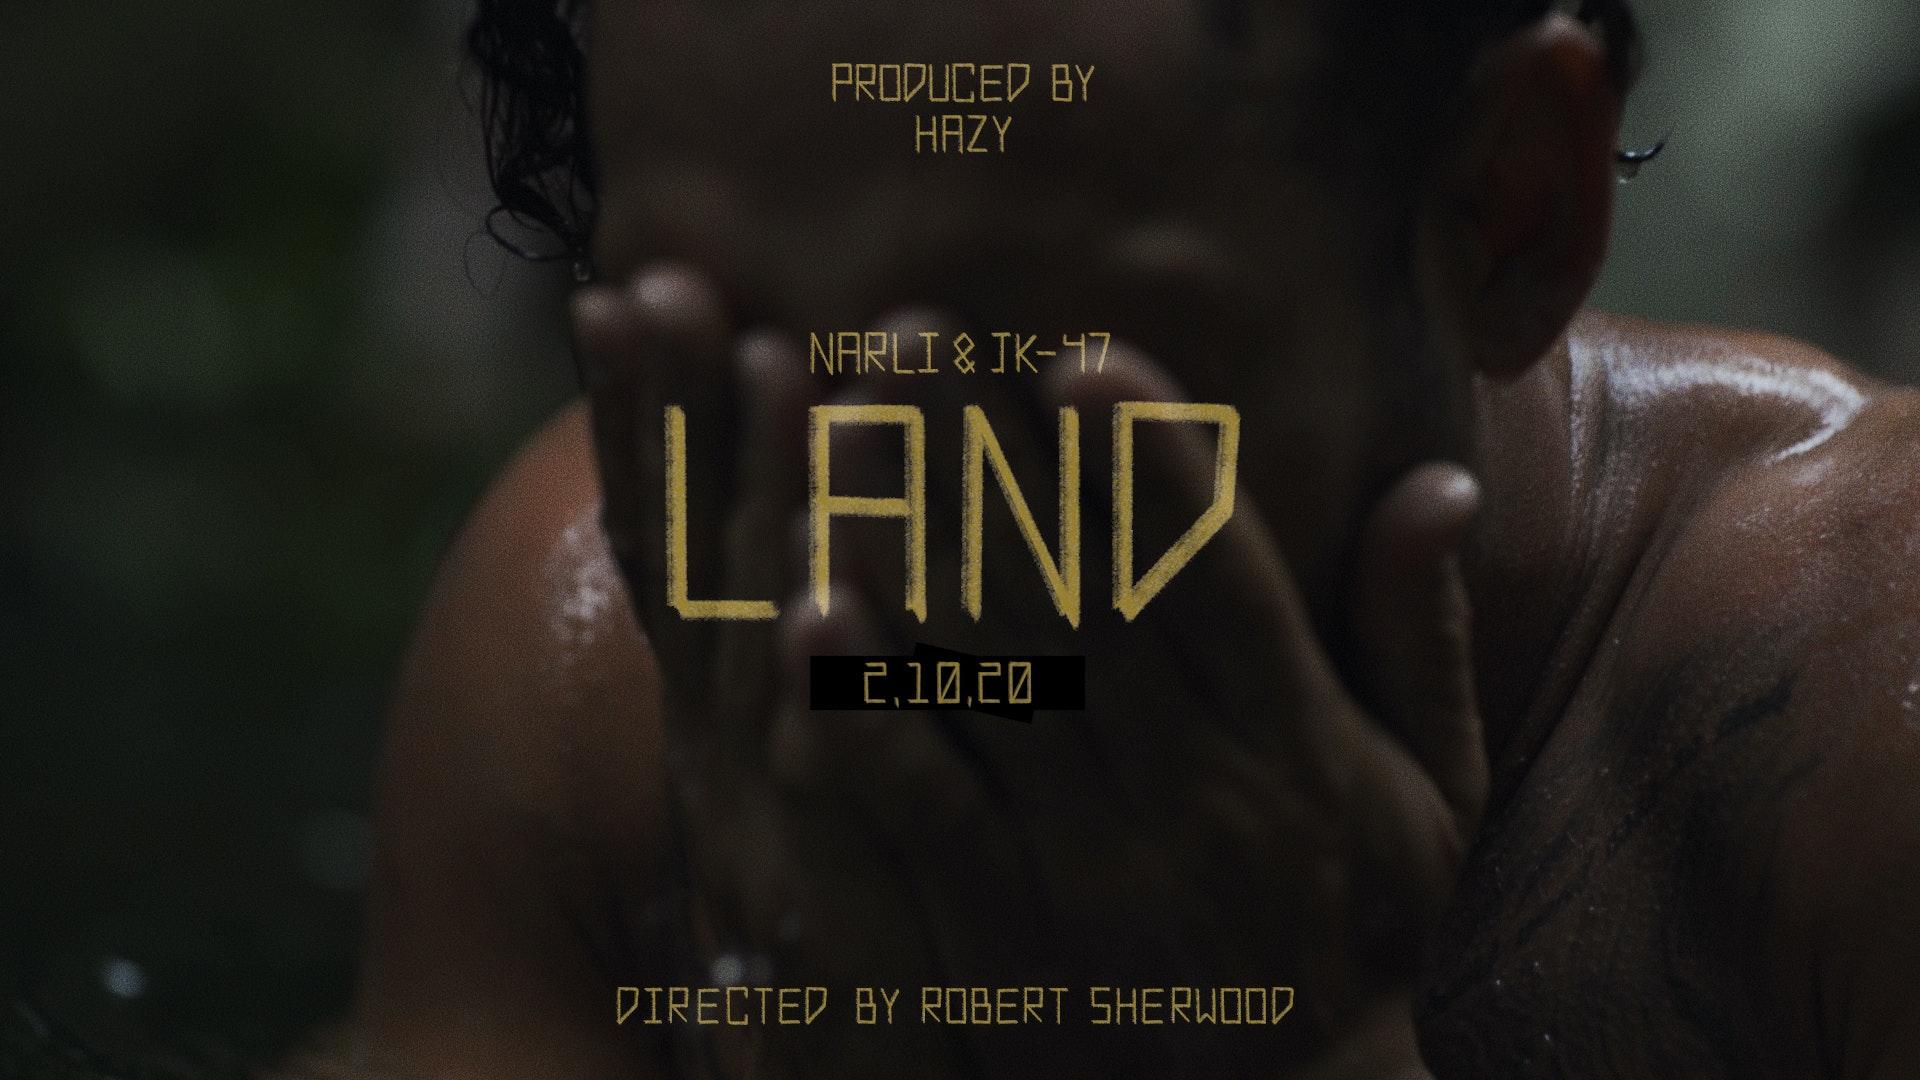 'LAND' Narli & JK-47